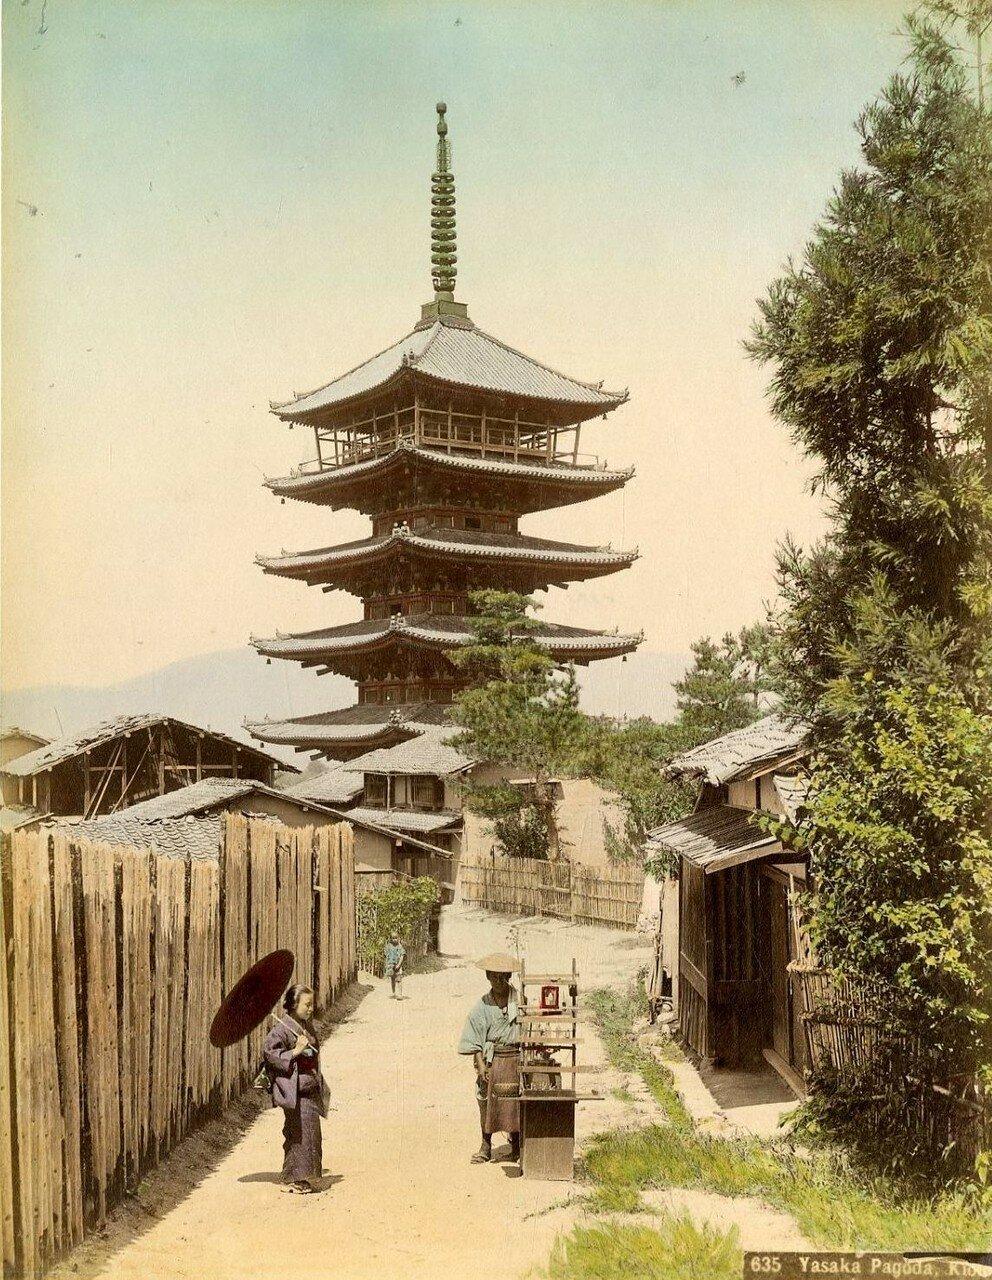 Киото. Храм Ясака